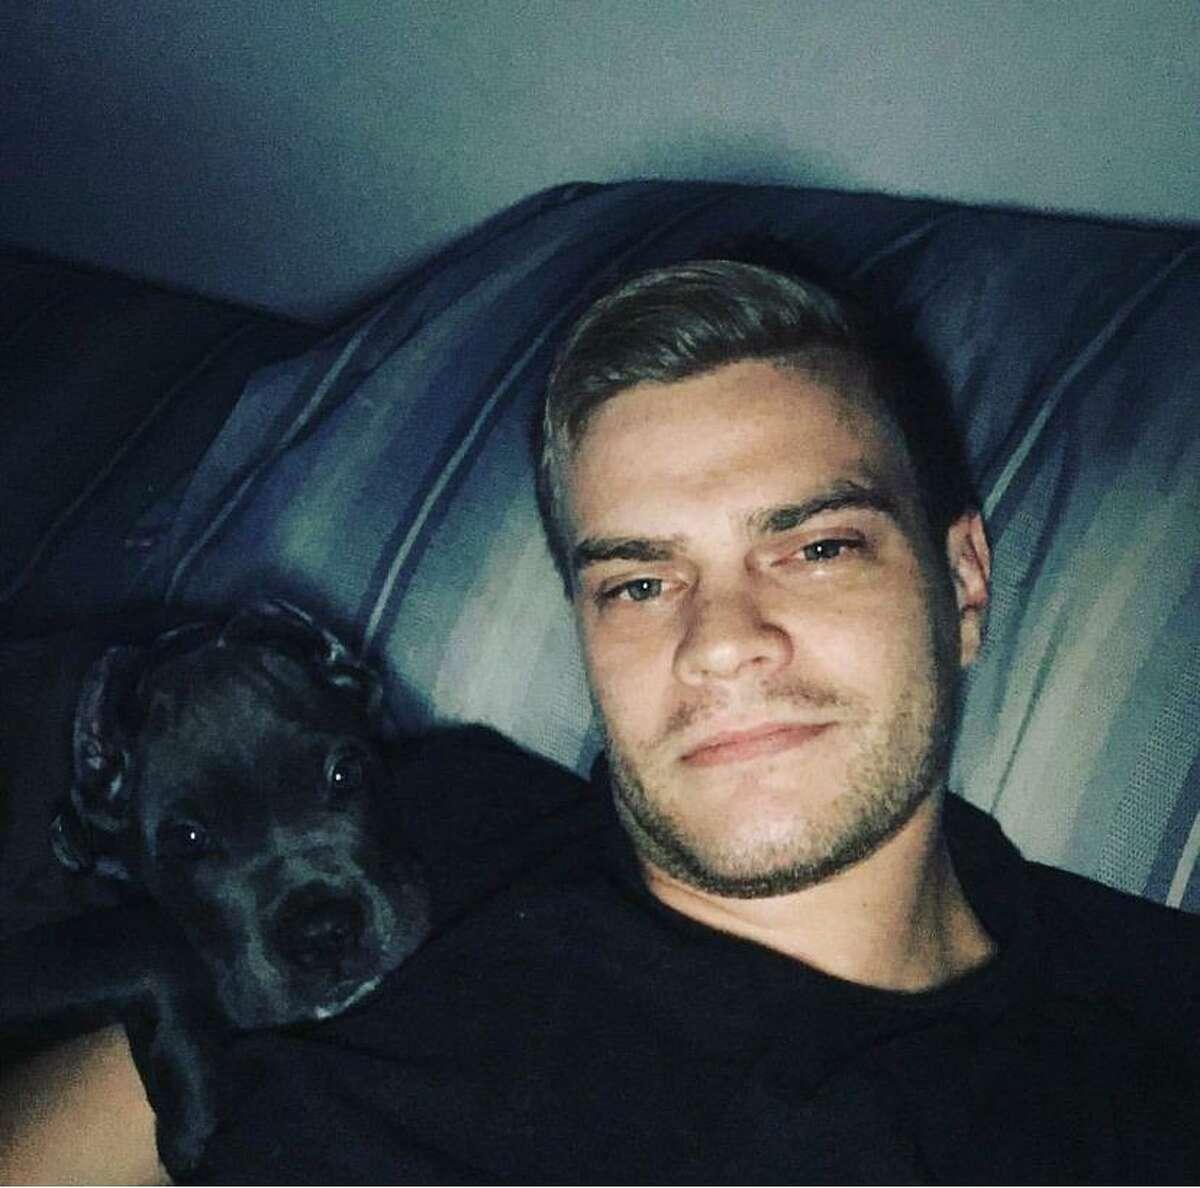 Ryan Camaioni and Zeus